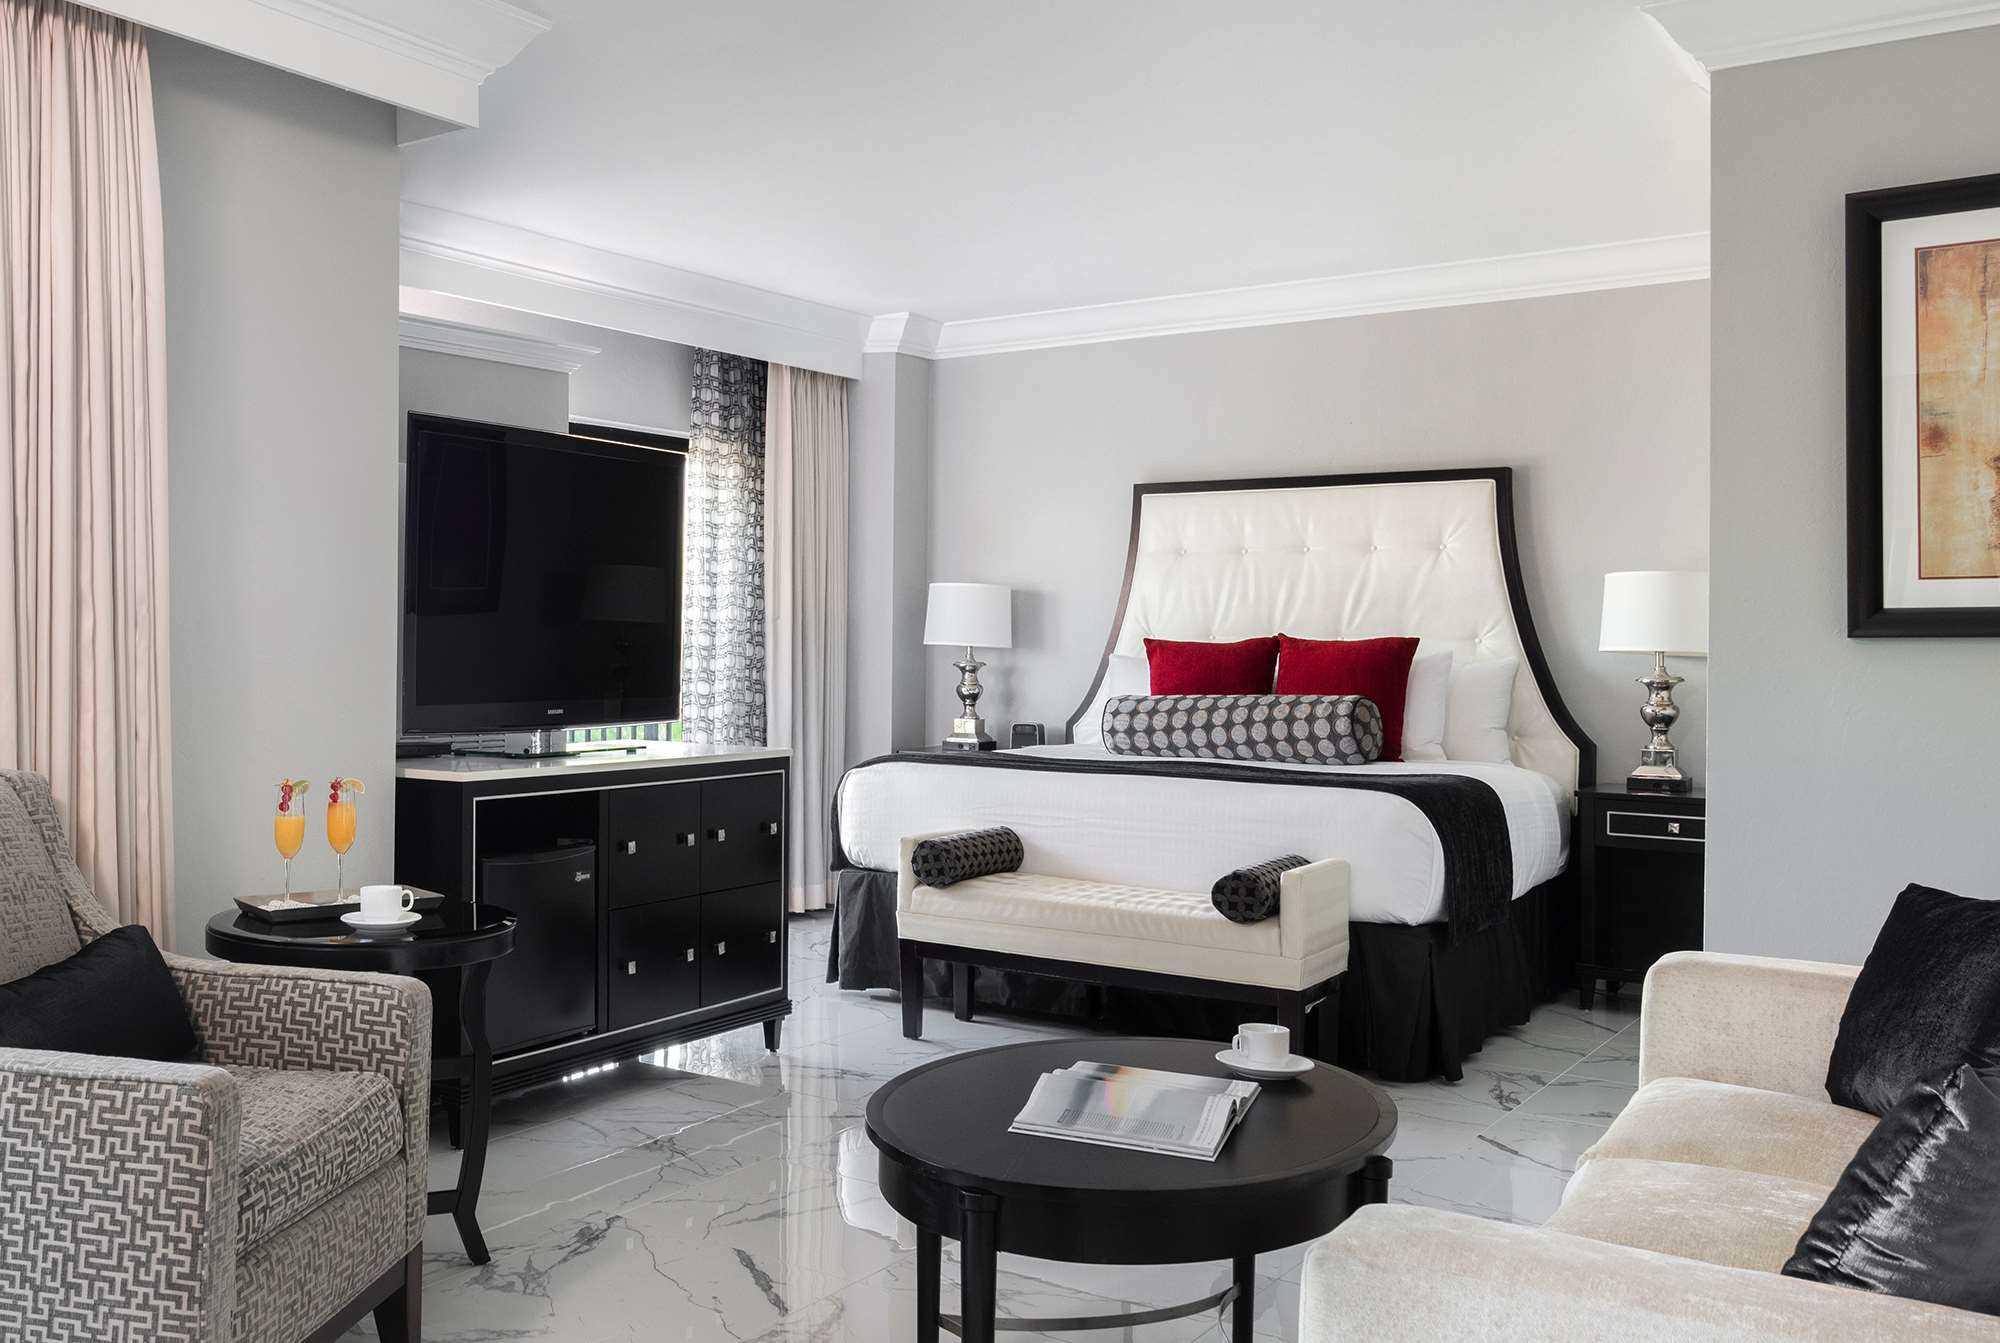 Rooms & Suites Image